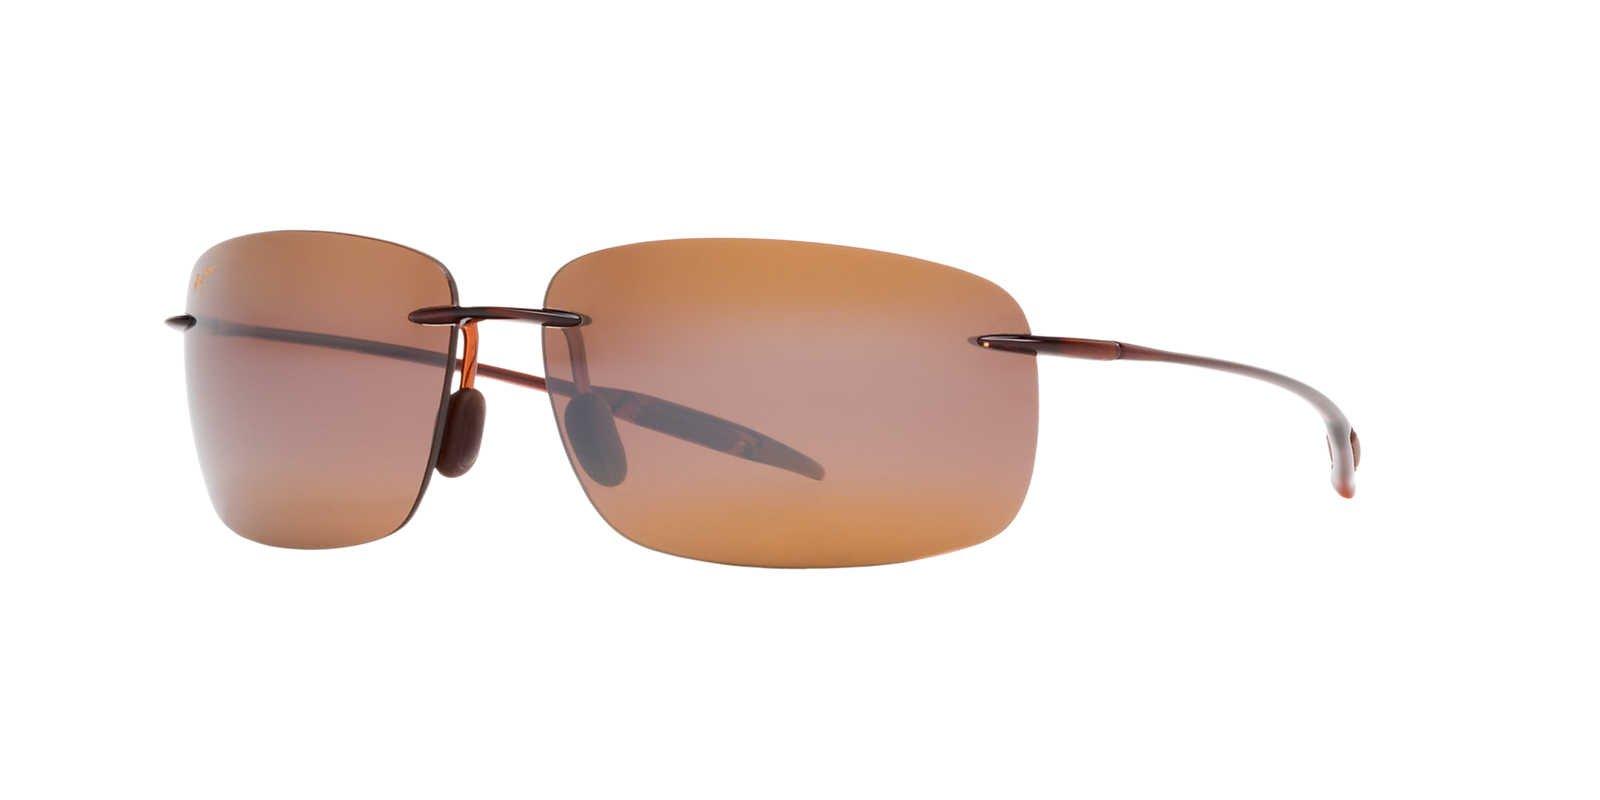 Maui Jim Mens Breakwall Sunglasses (422) Brown/Bronze Plastic,Acetate - Polarized - 63mm